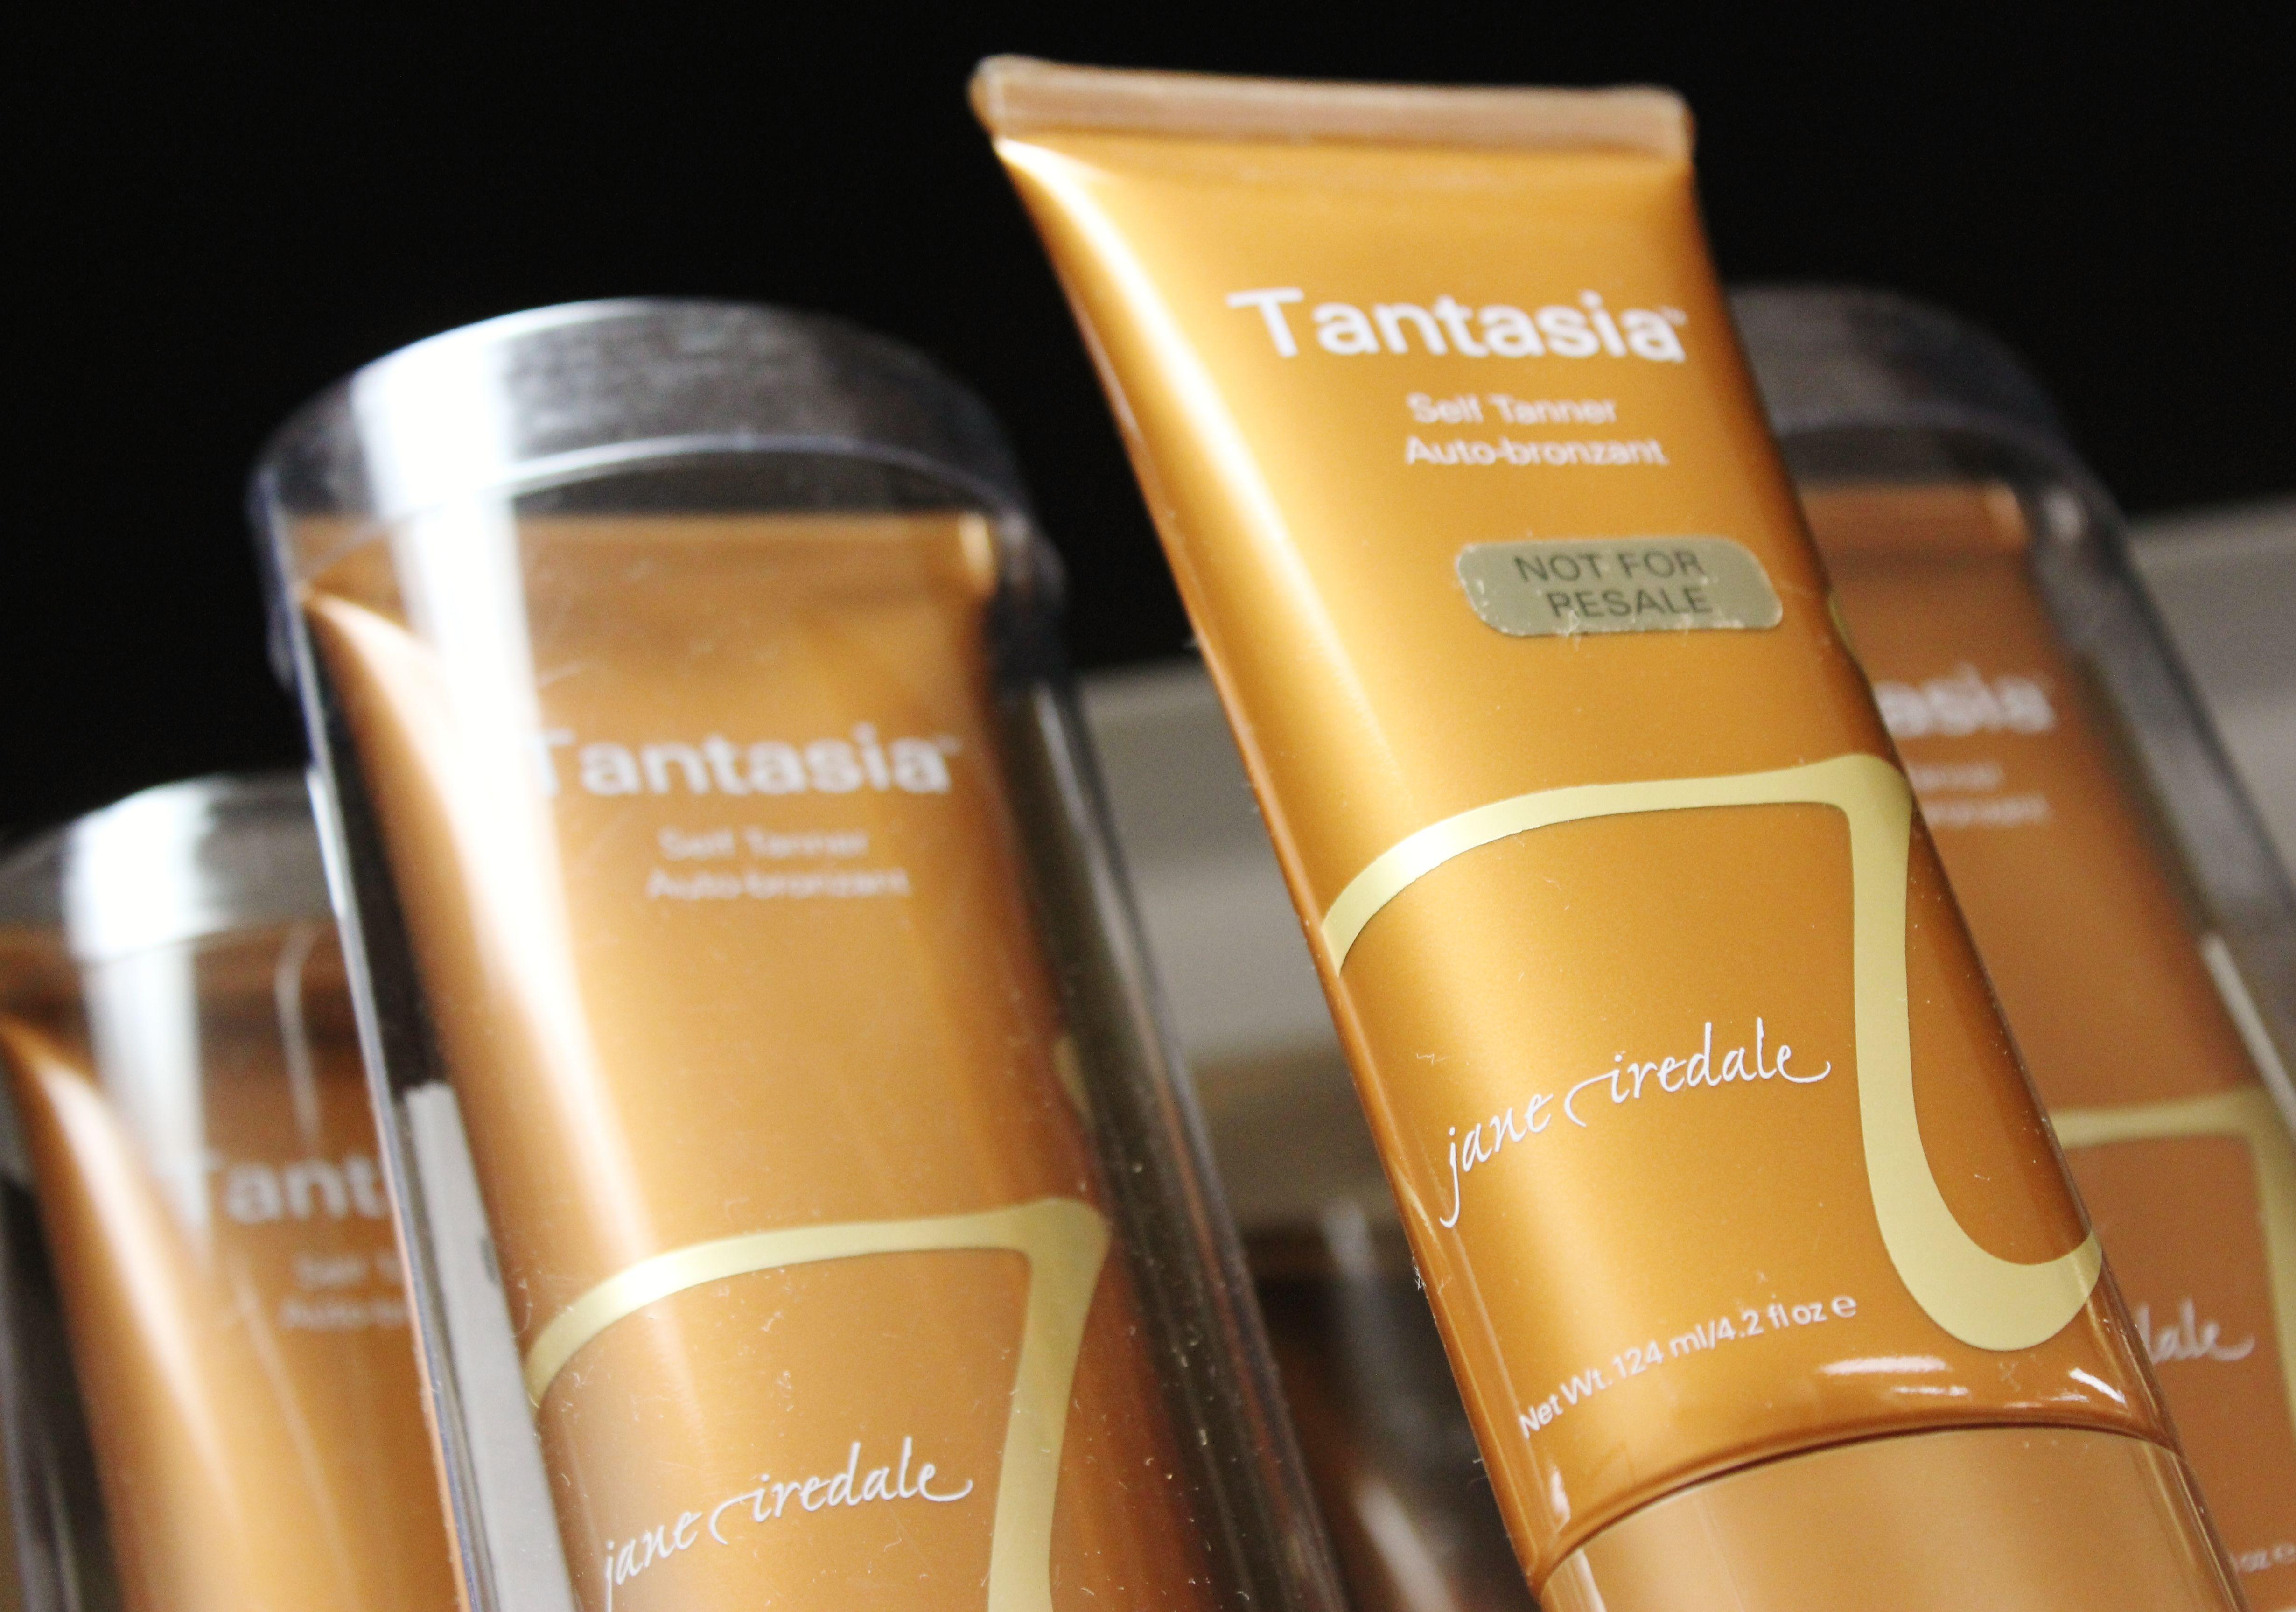 Tantasia! Amazing self tanner! Jane iredale makeup